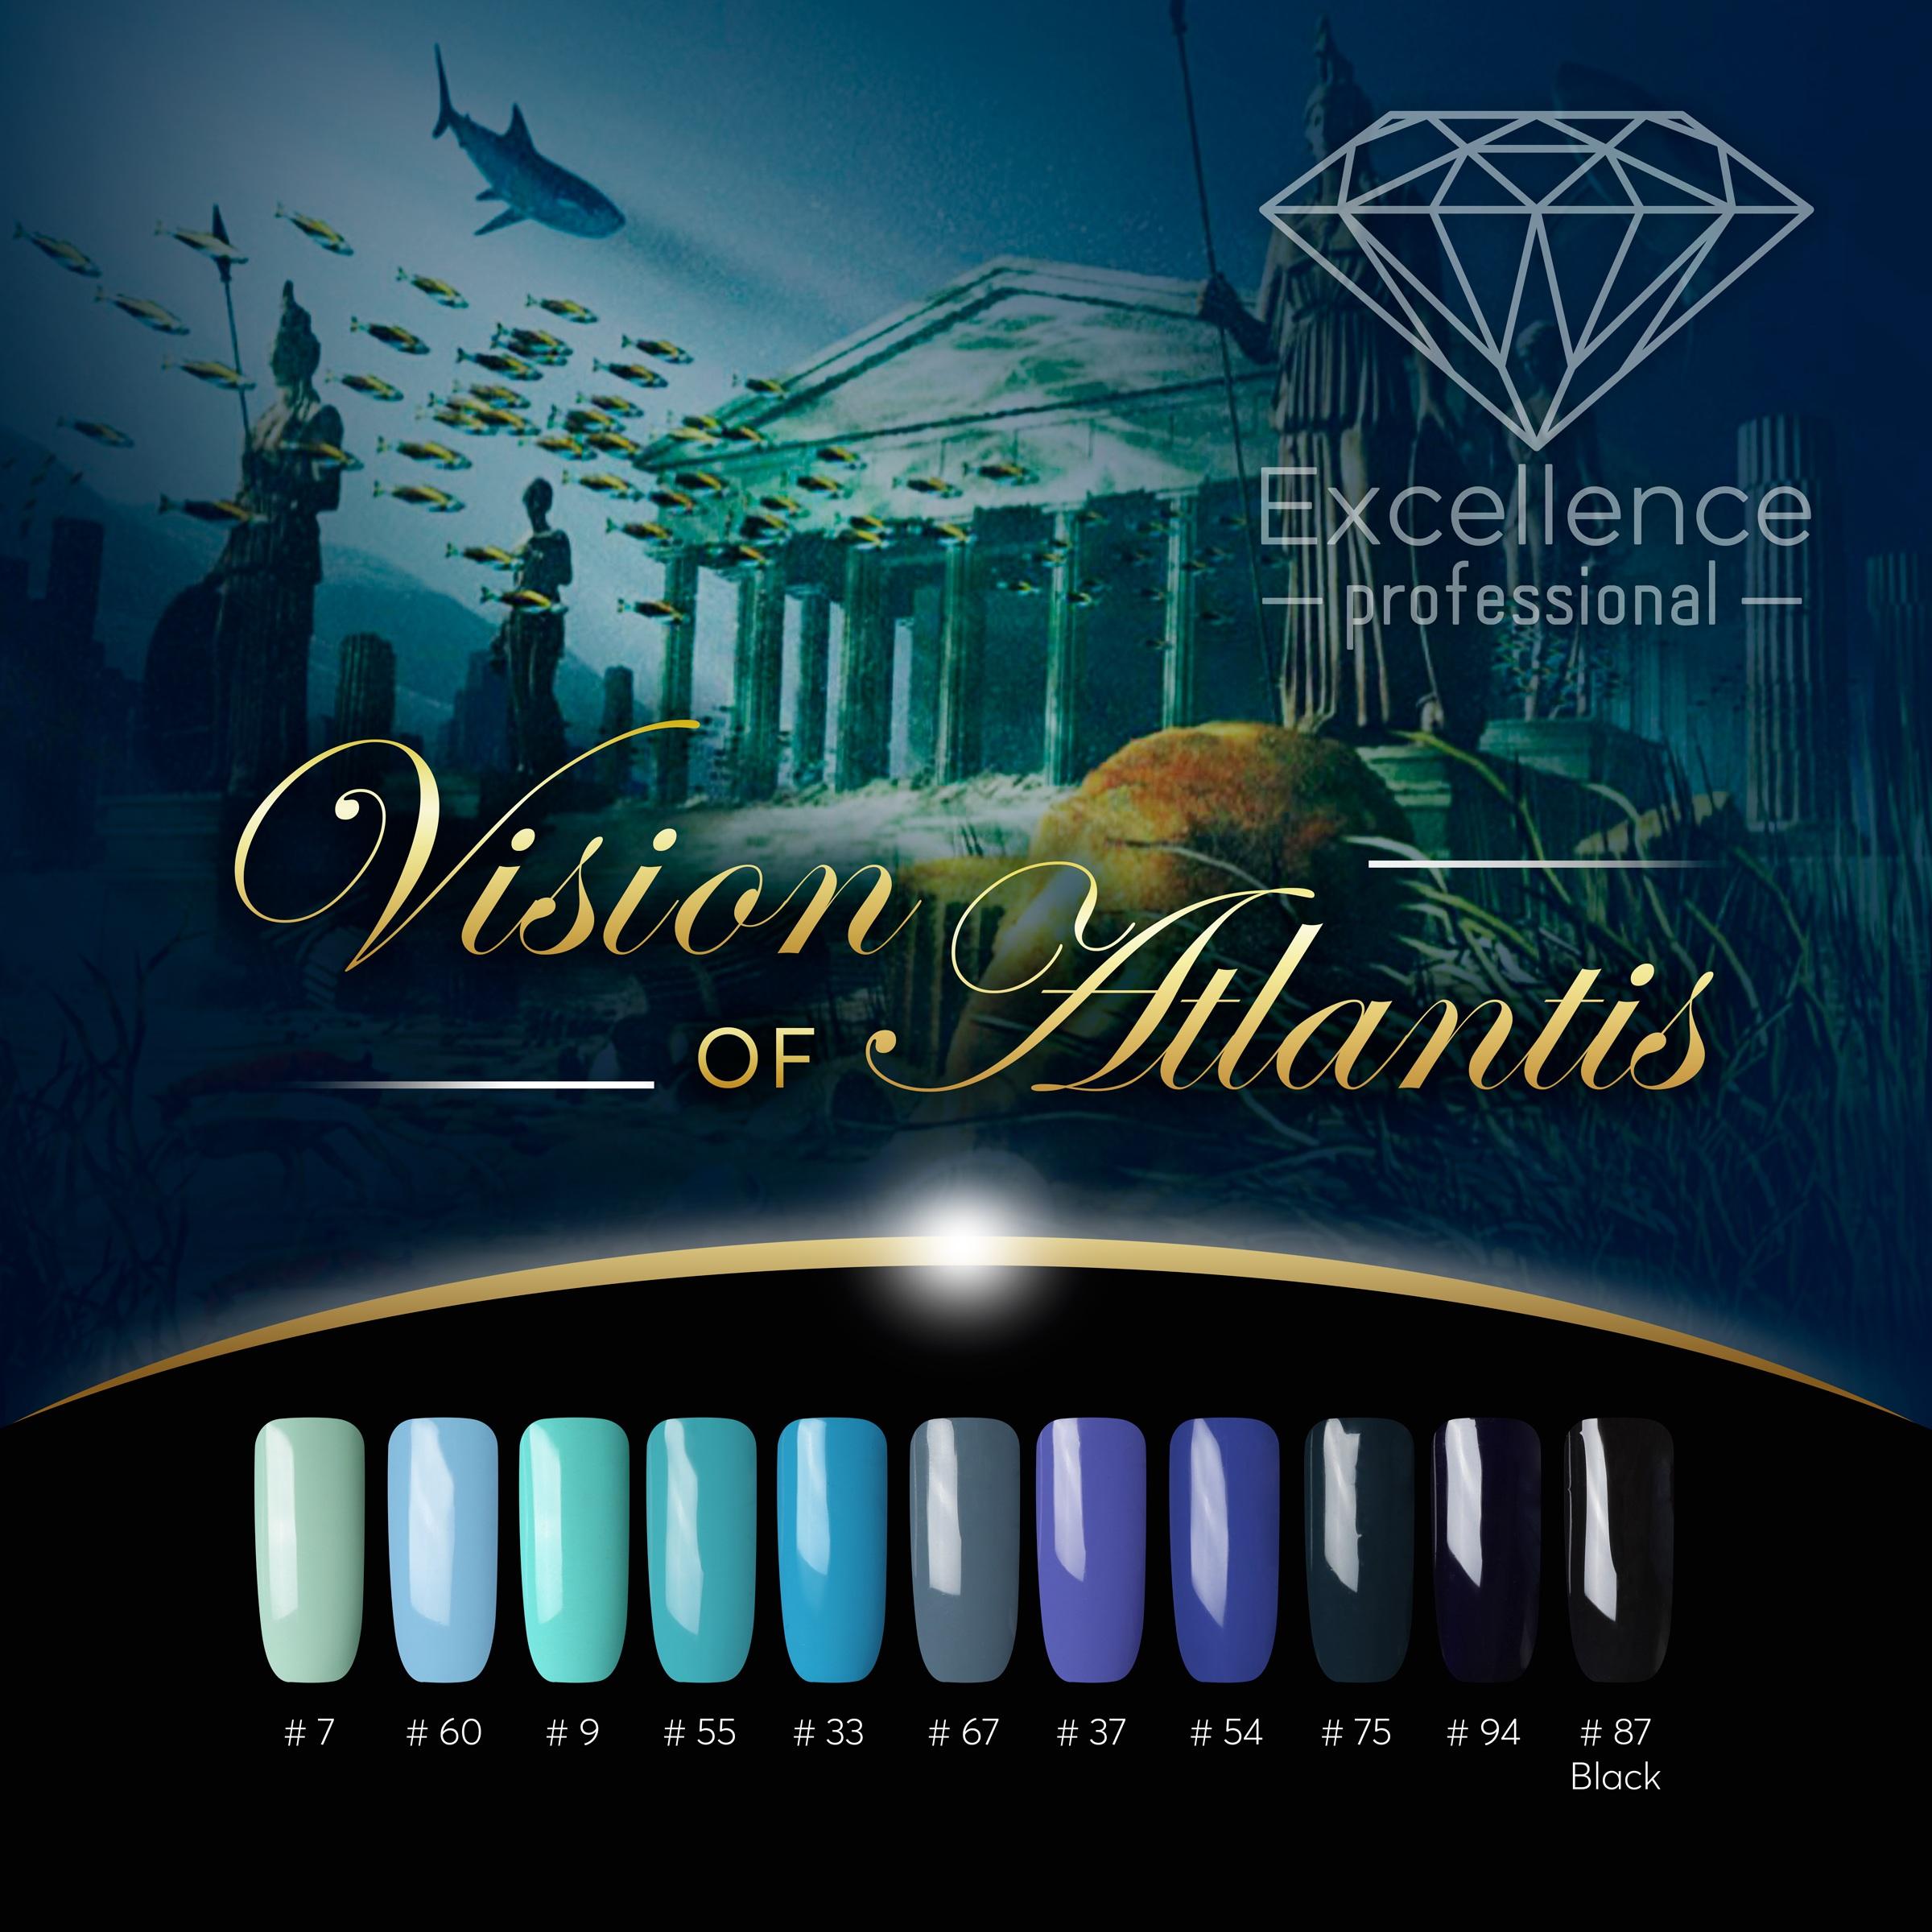 Vision-of-Atlantis_3